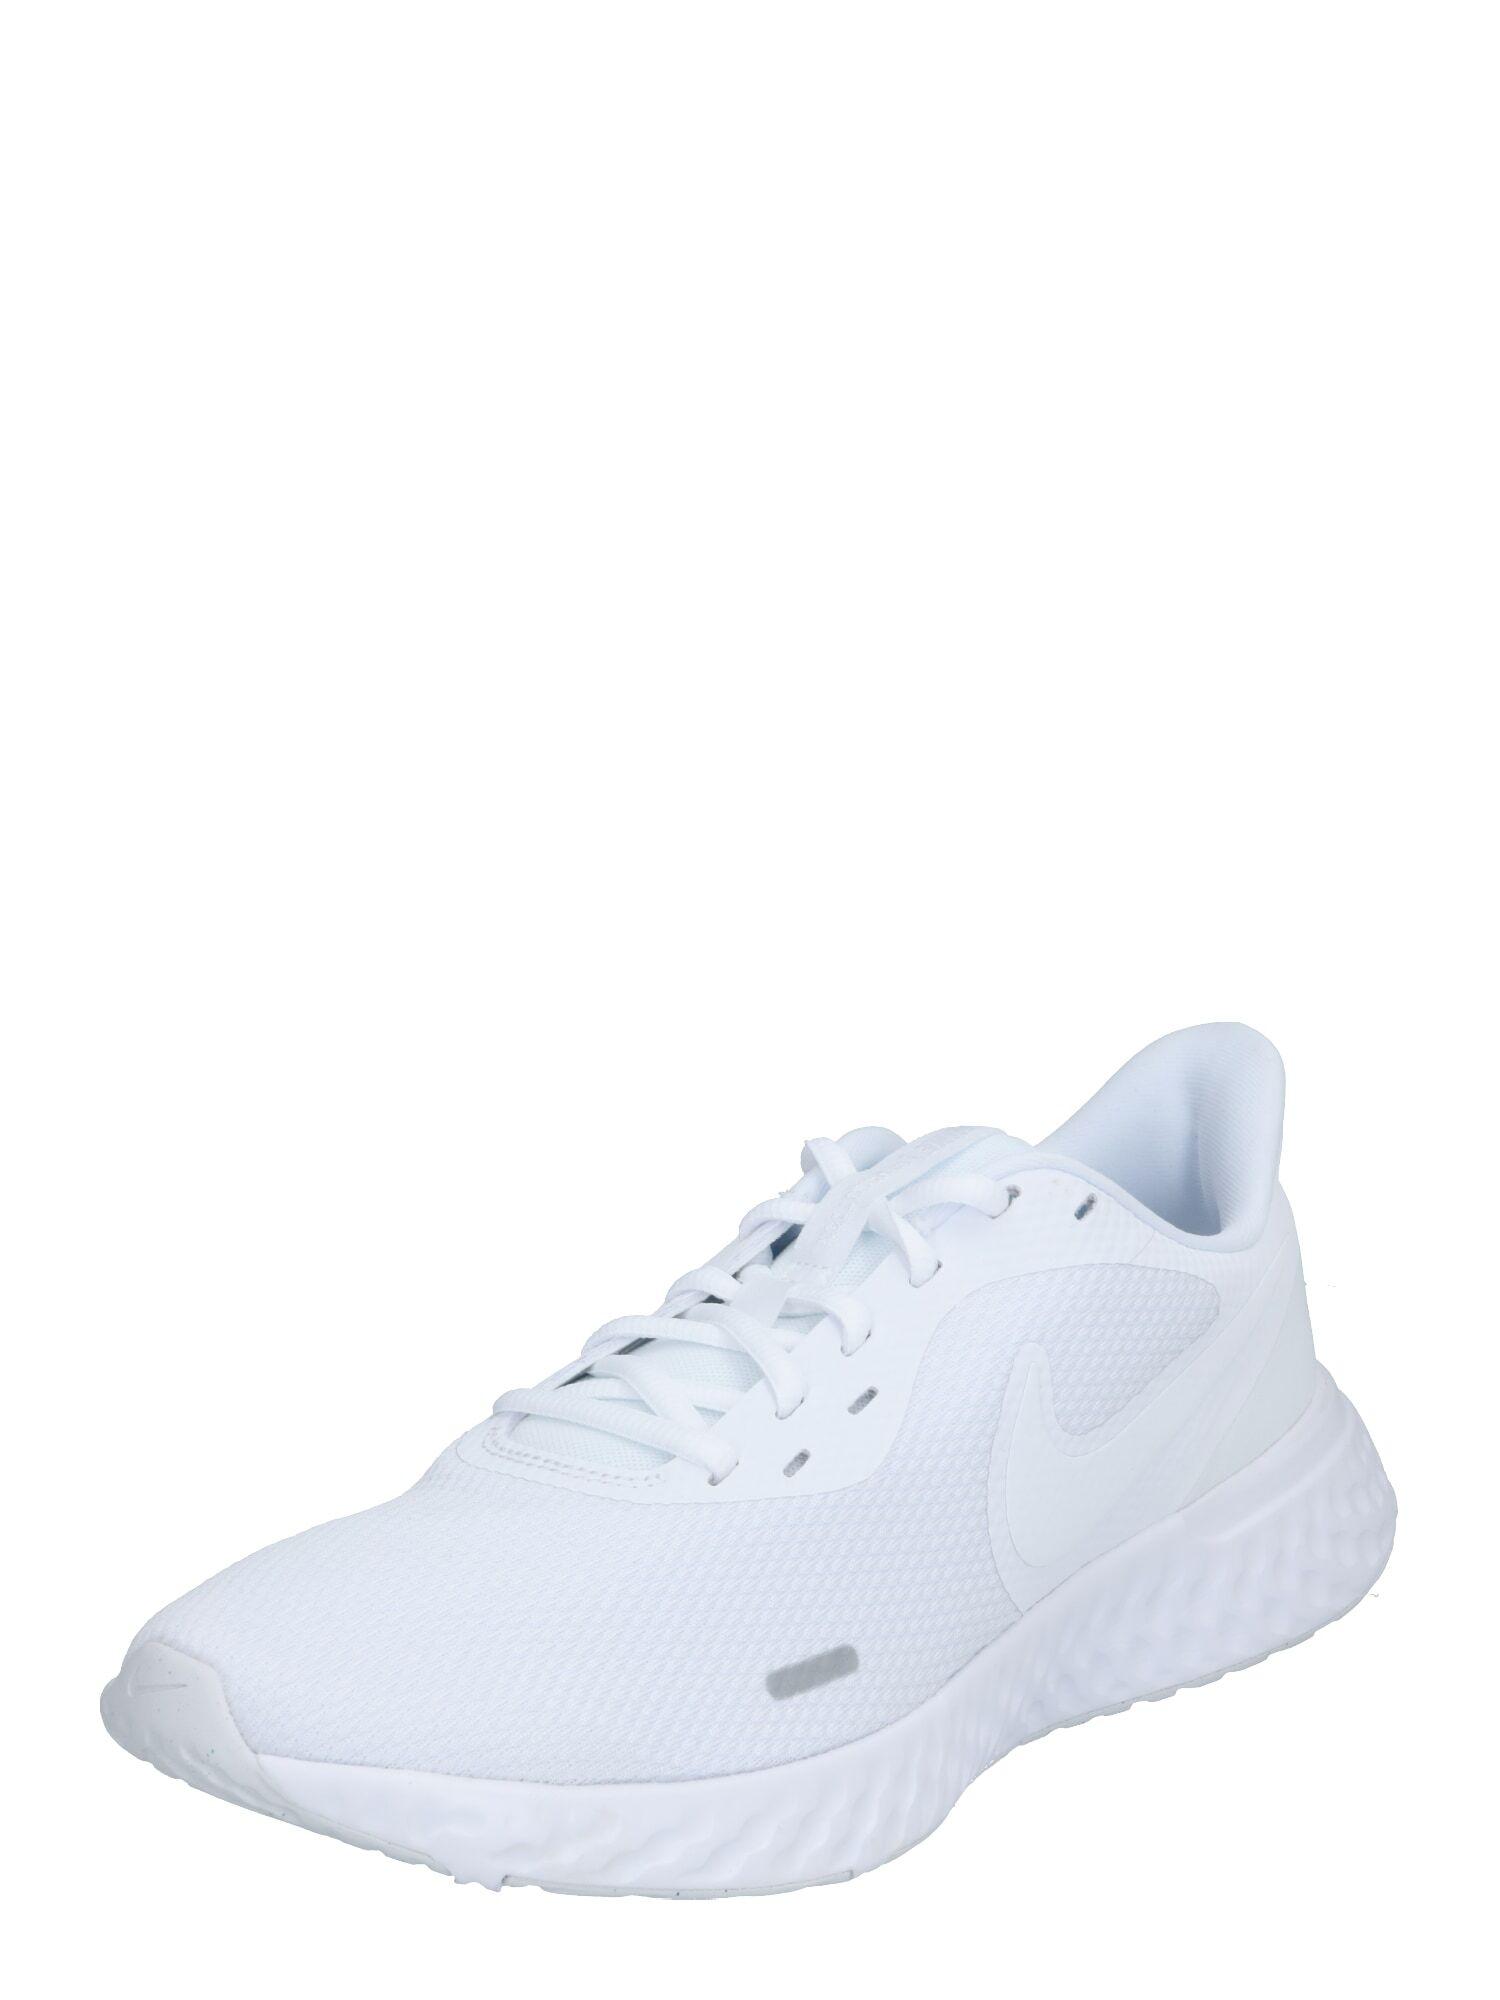 NIKE Chaussure de course 'Revolution 5'  - Blanc - Taille: 9.5 - female